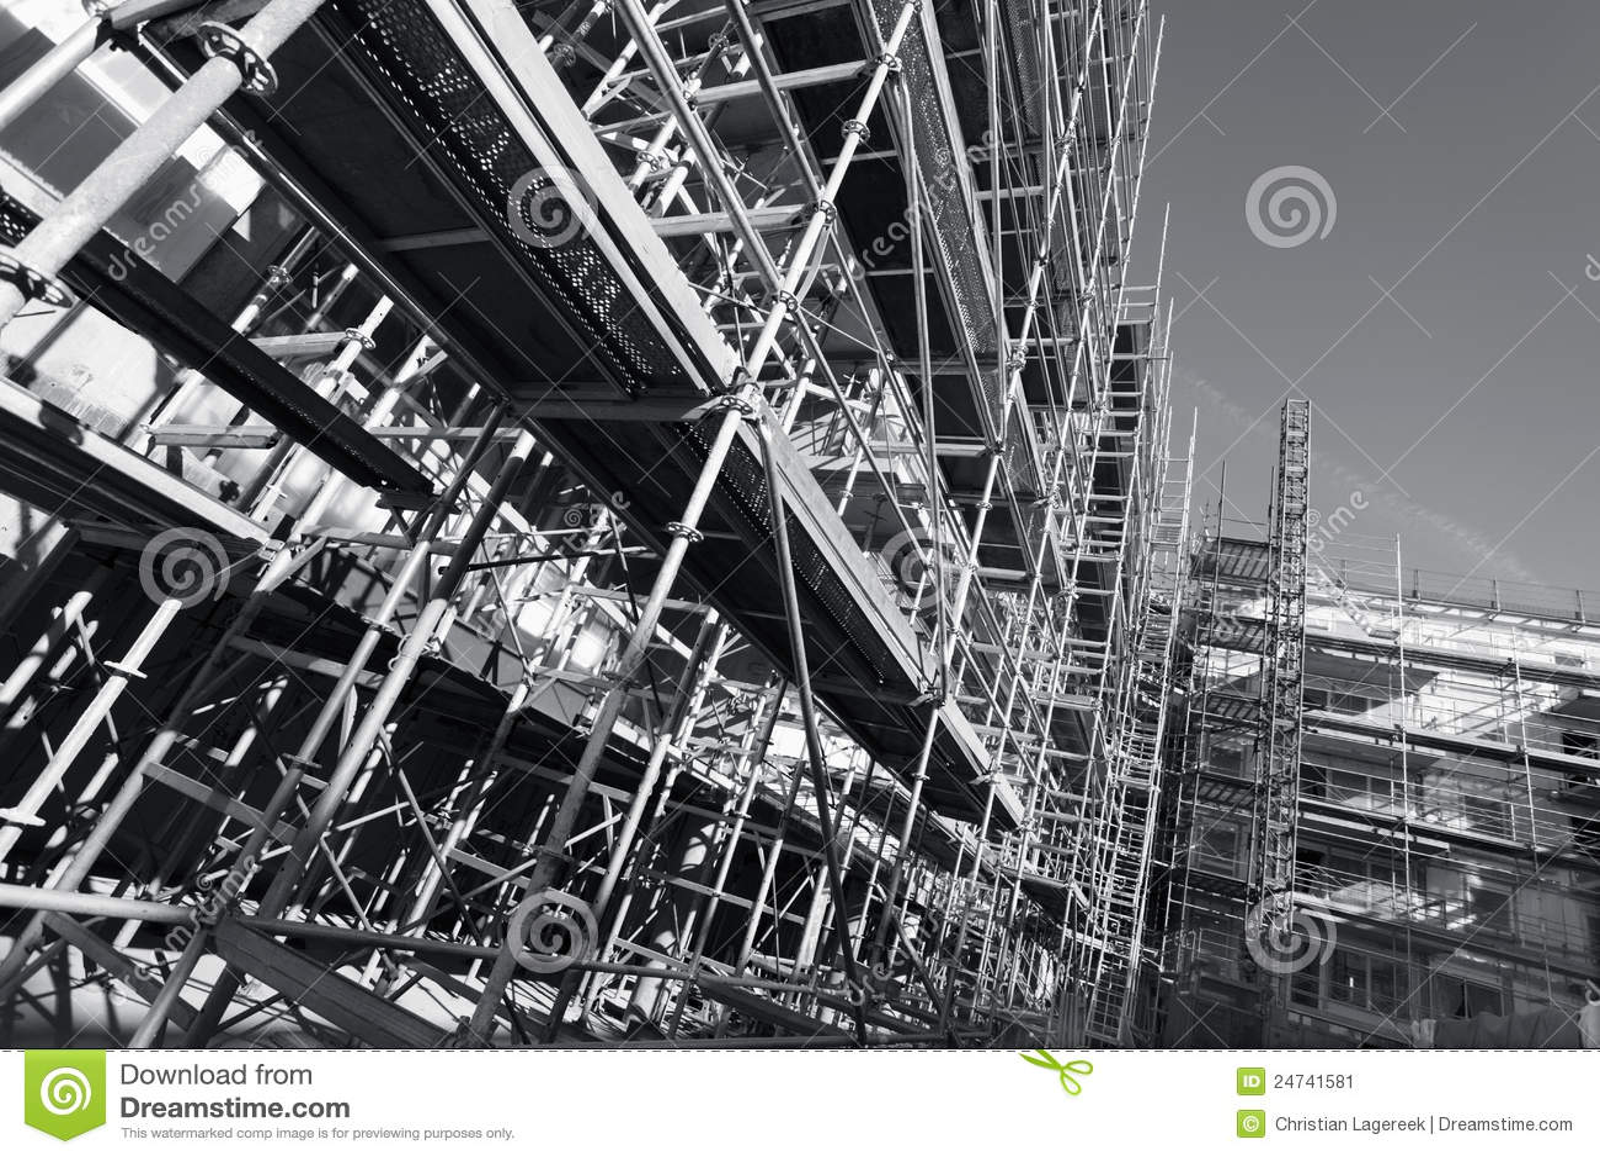 Construction Scaffolding Design : Construction scaffolding stock image